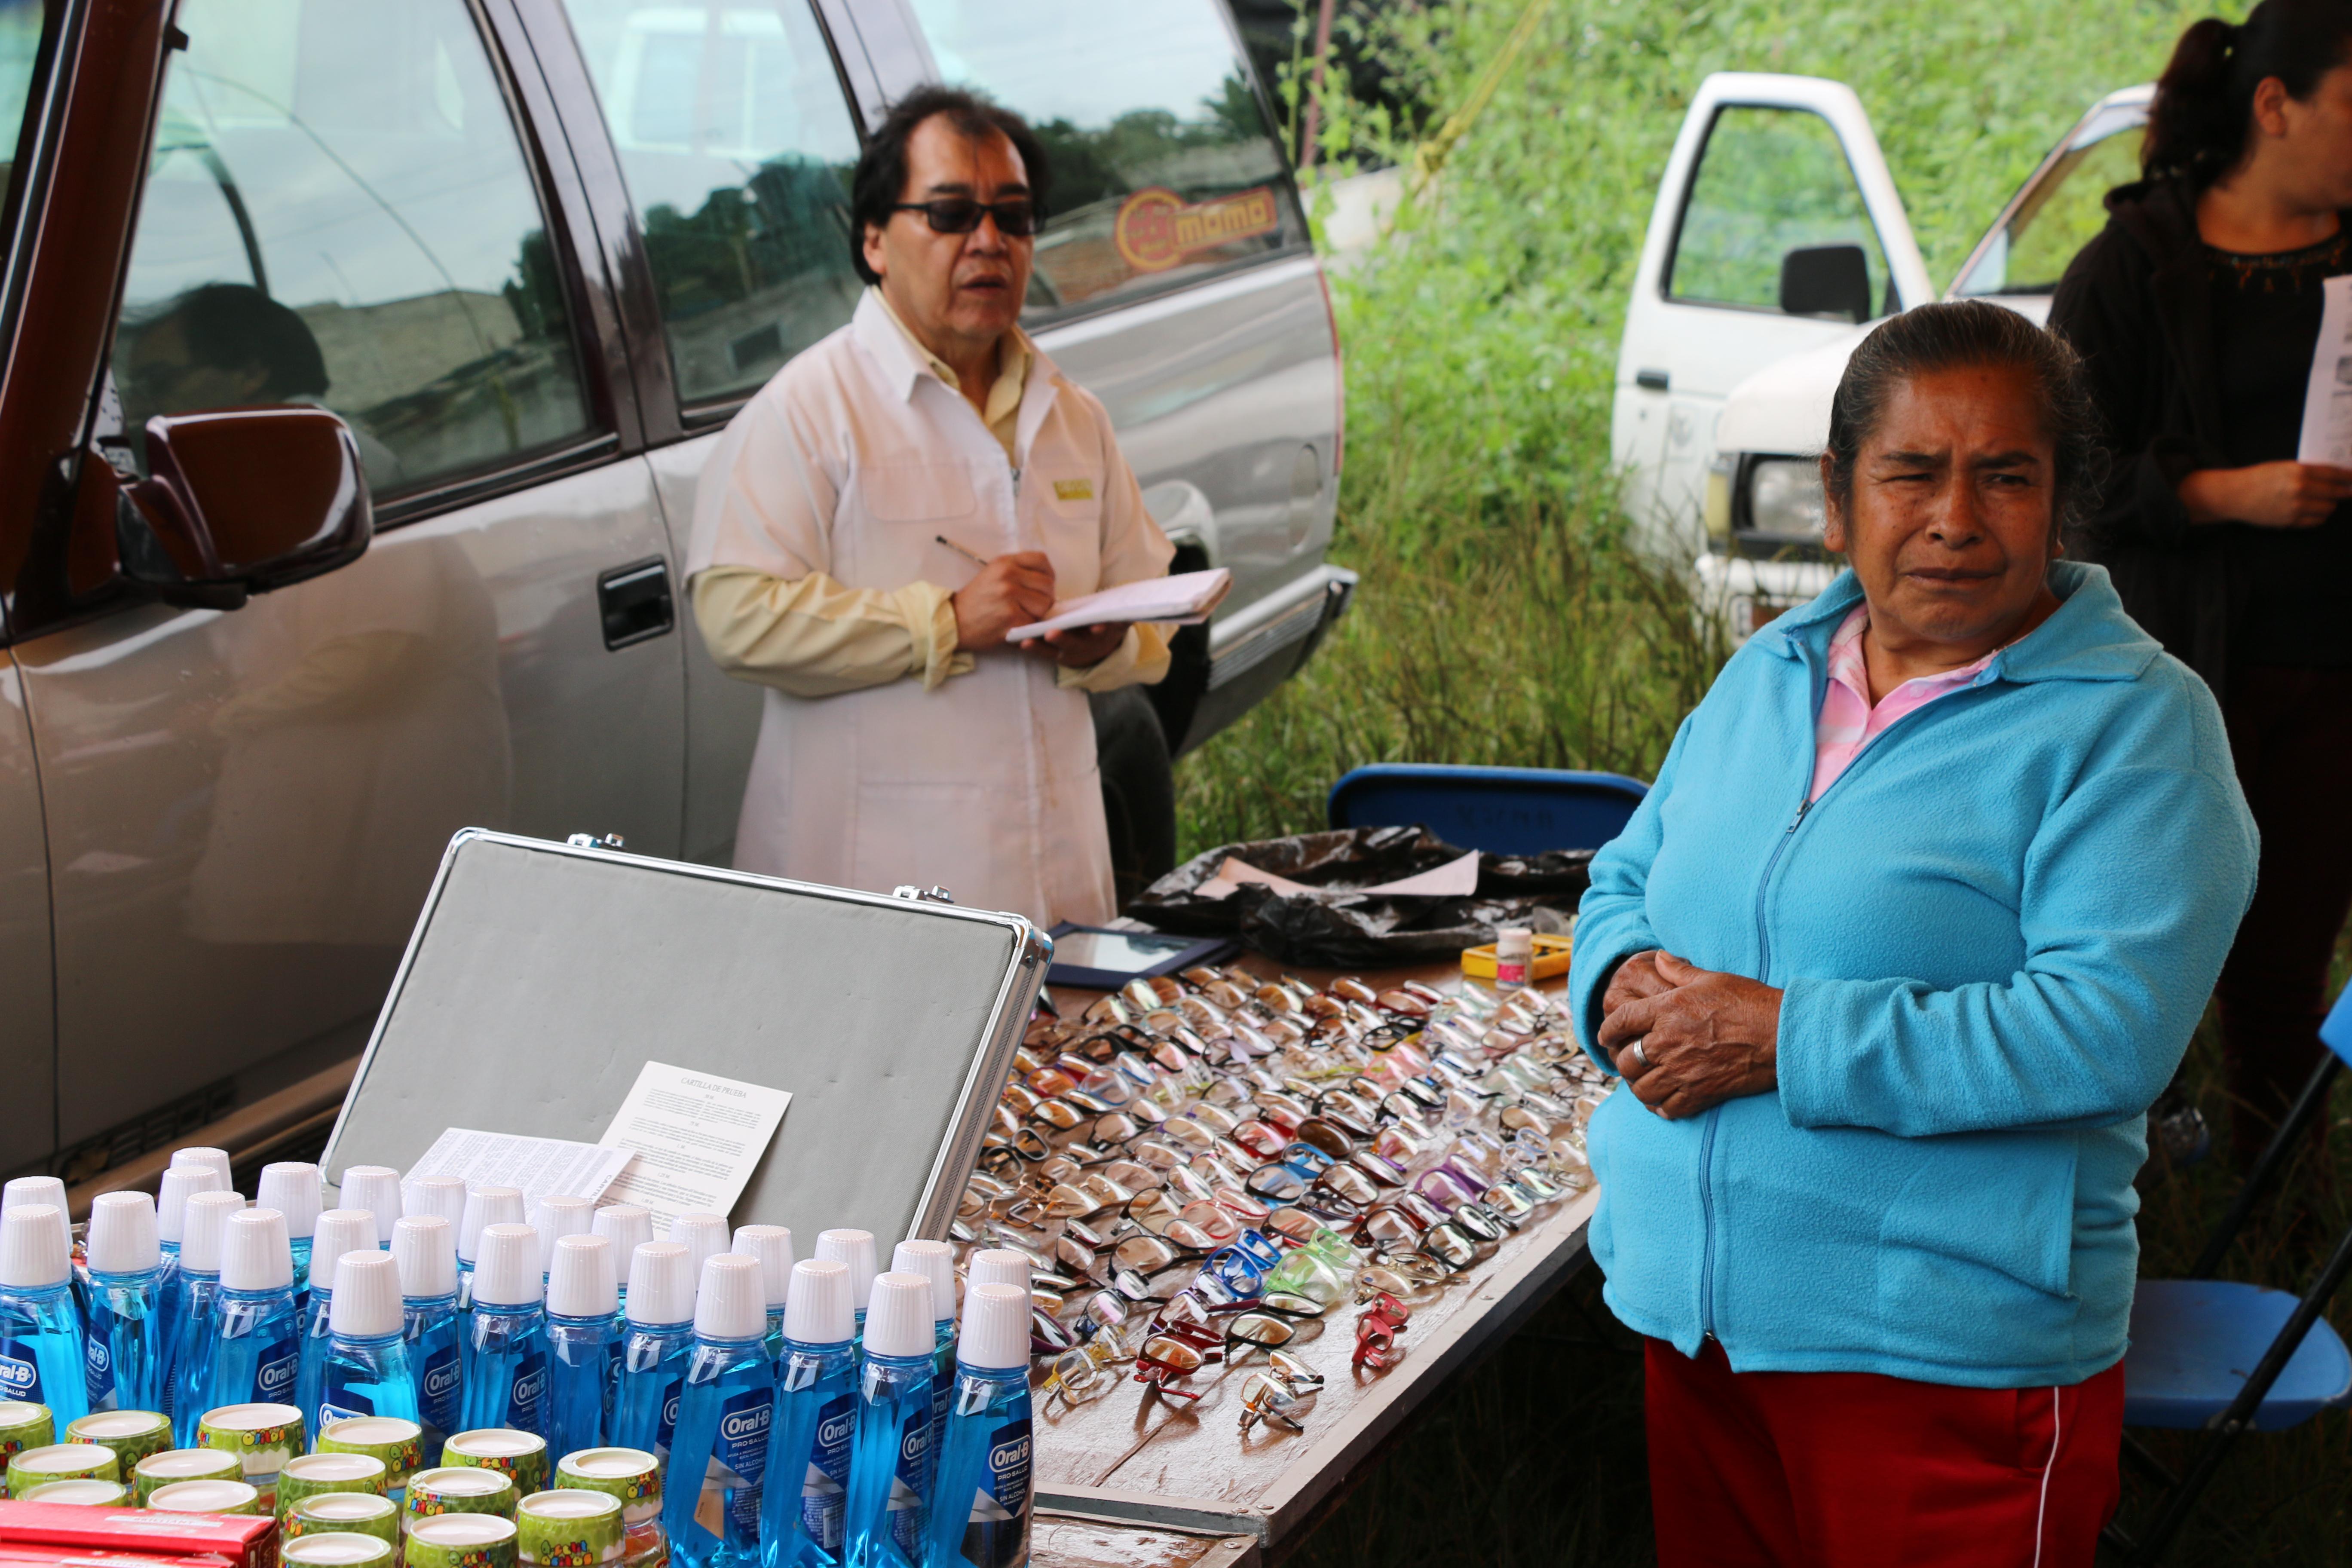 APOYAN A PERSONAS EN SITUACIÓN VULNERABLE CON DIVERSOS SERVICIOS GRATUITOS EN XOCHIMILCO